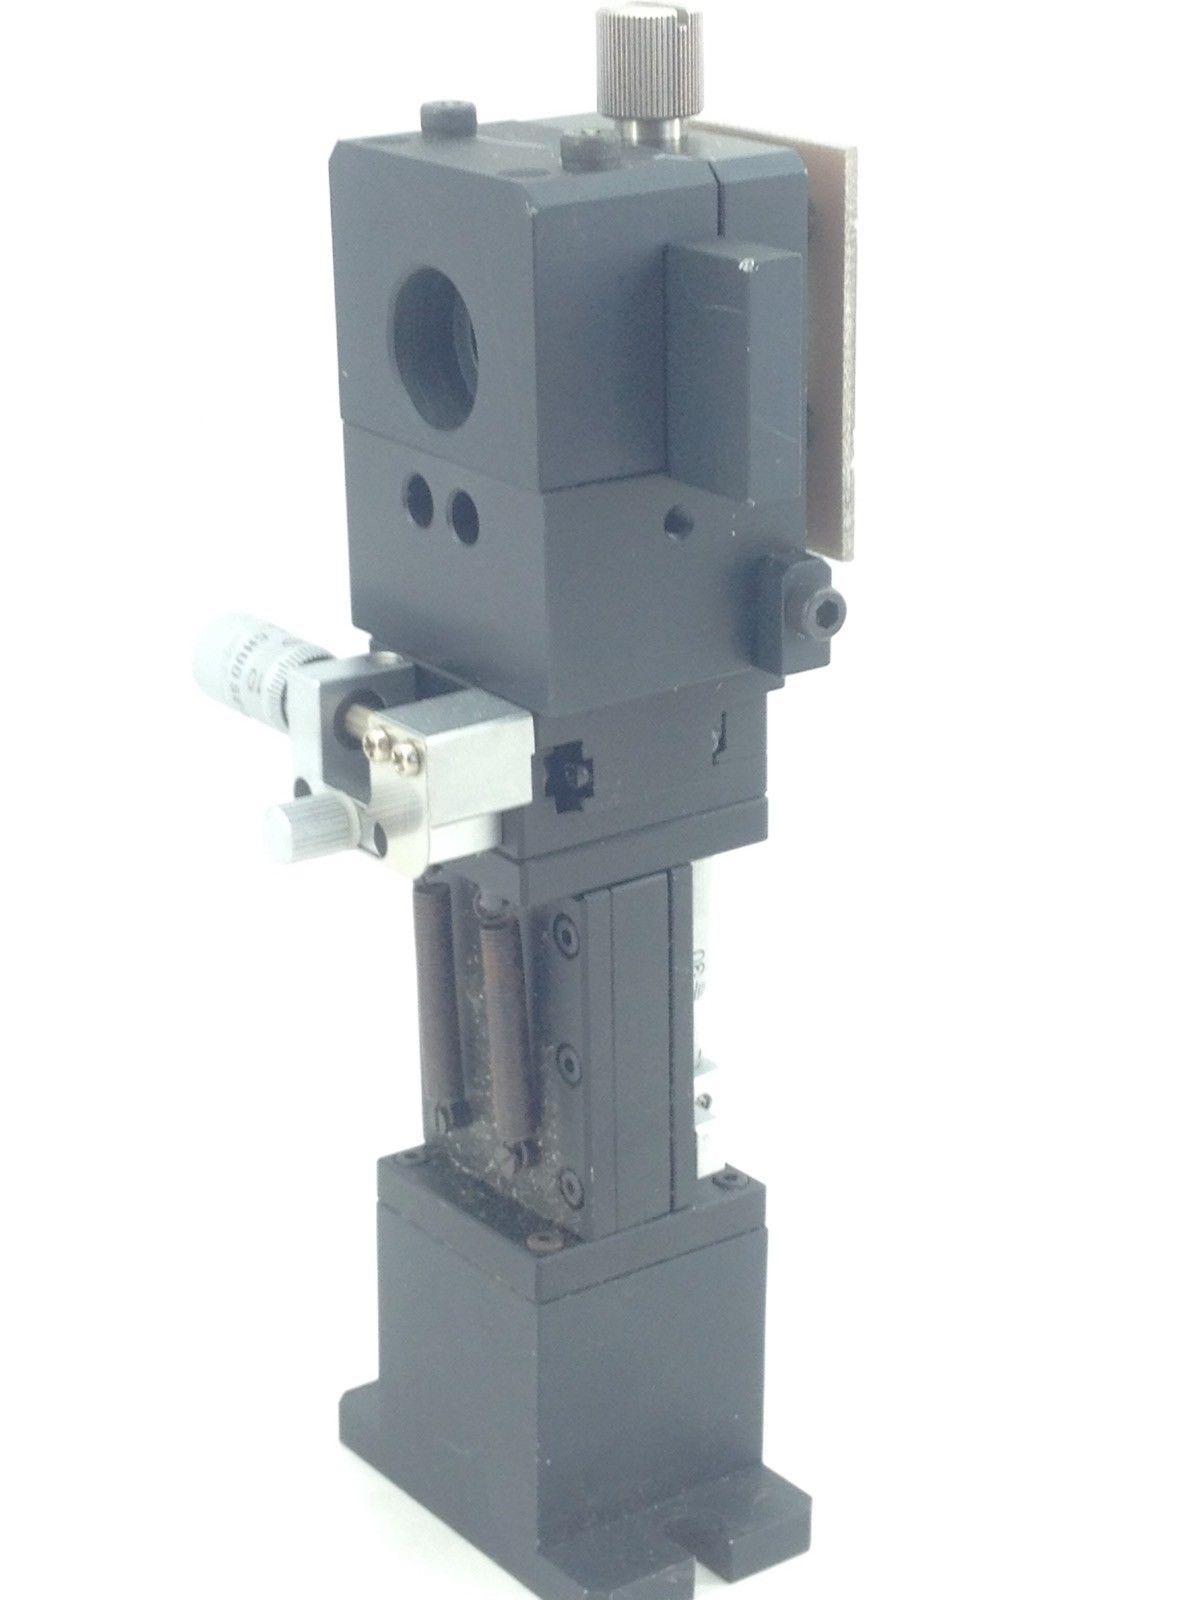 021128 MICRO-CONTROLLER BOARD OPTOMECHANICAL ASSY (H330) 6